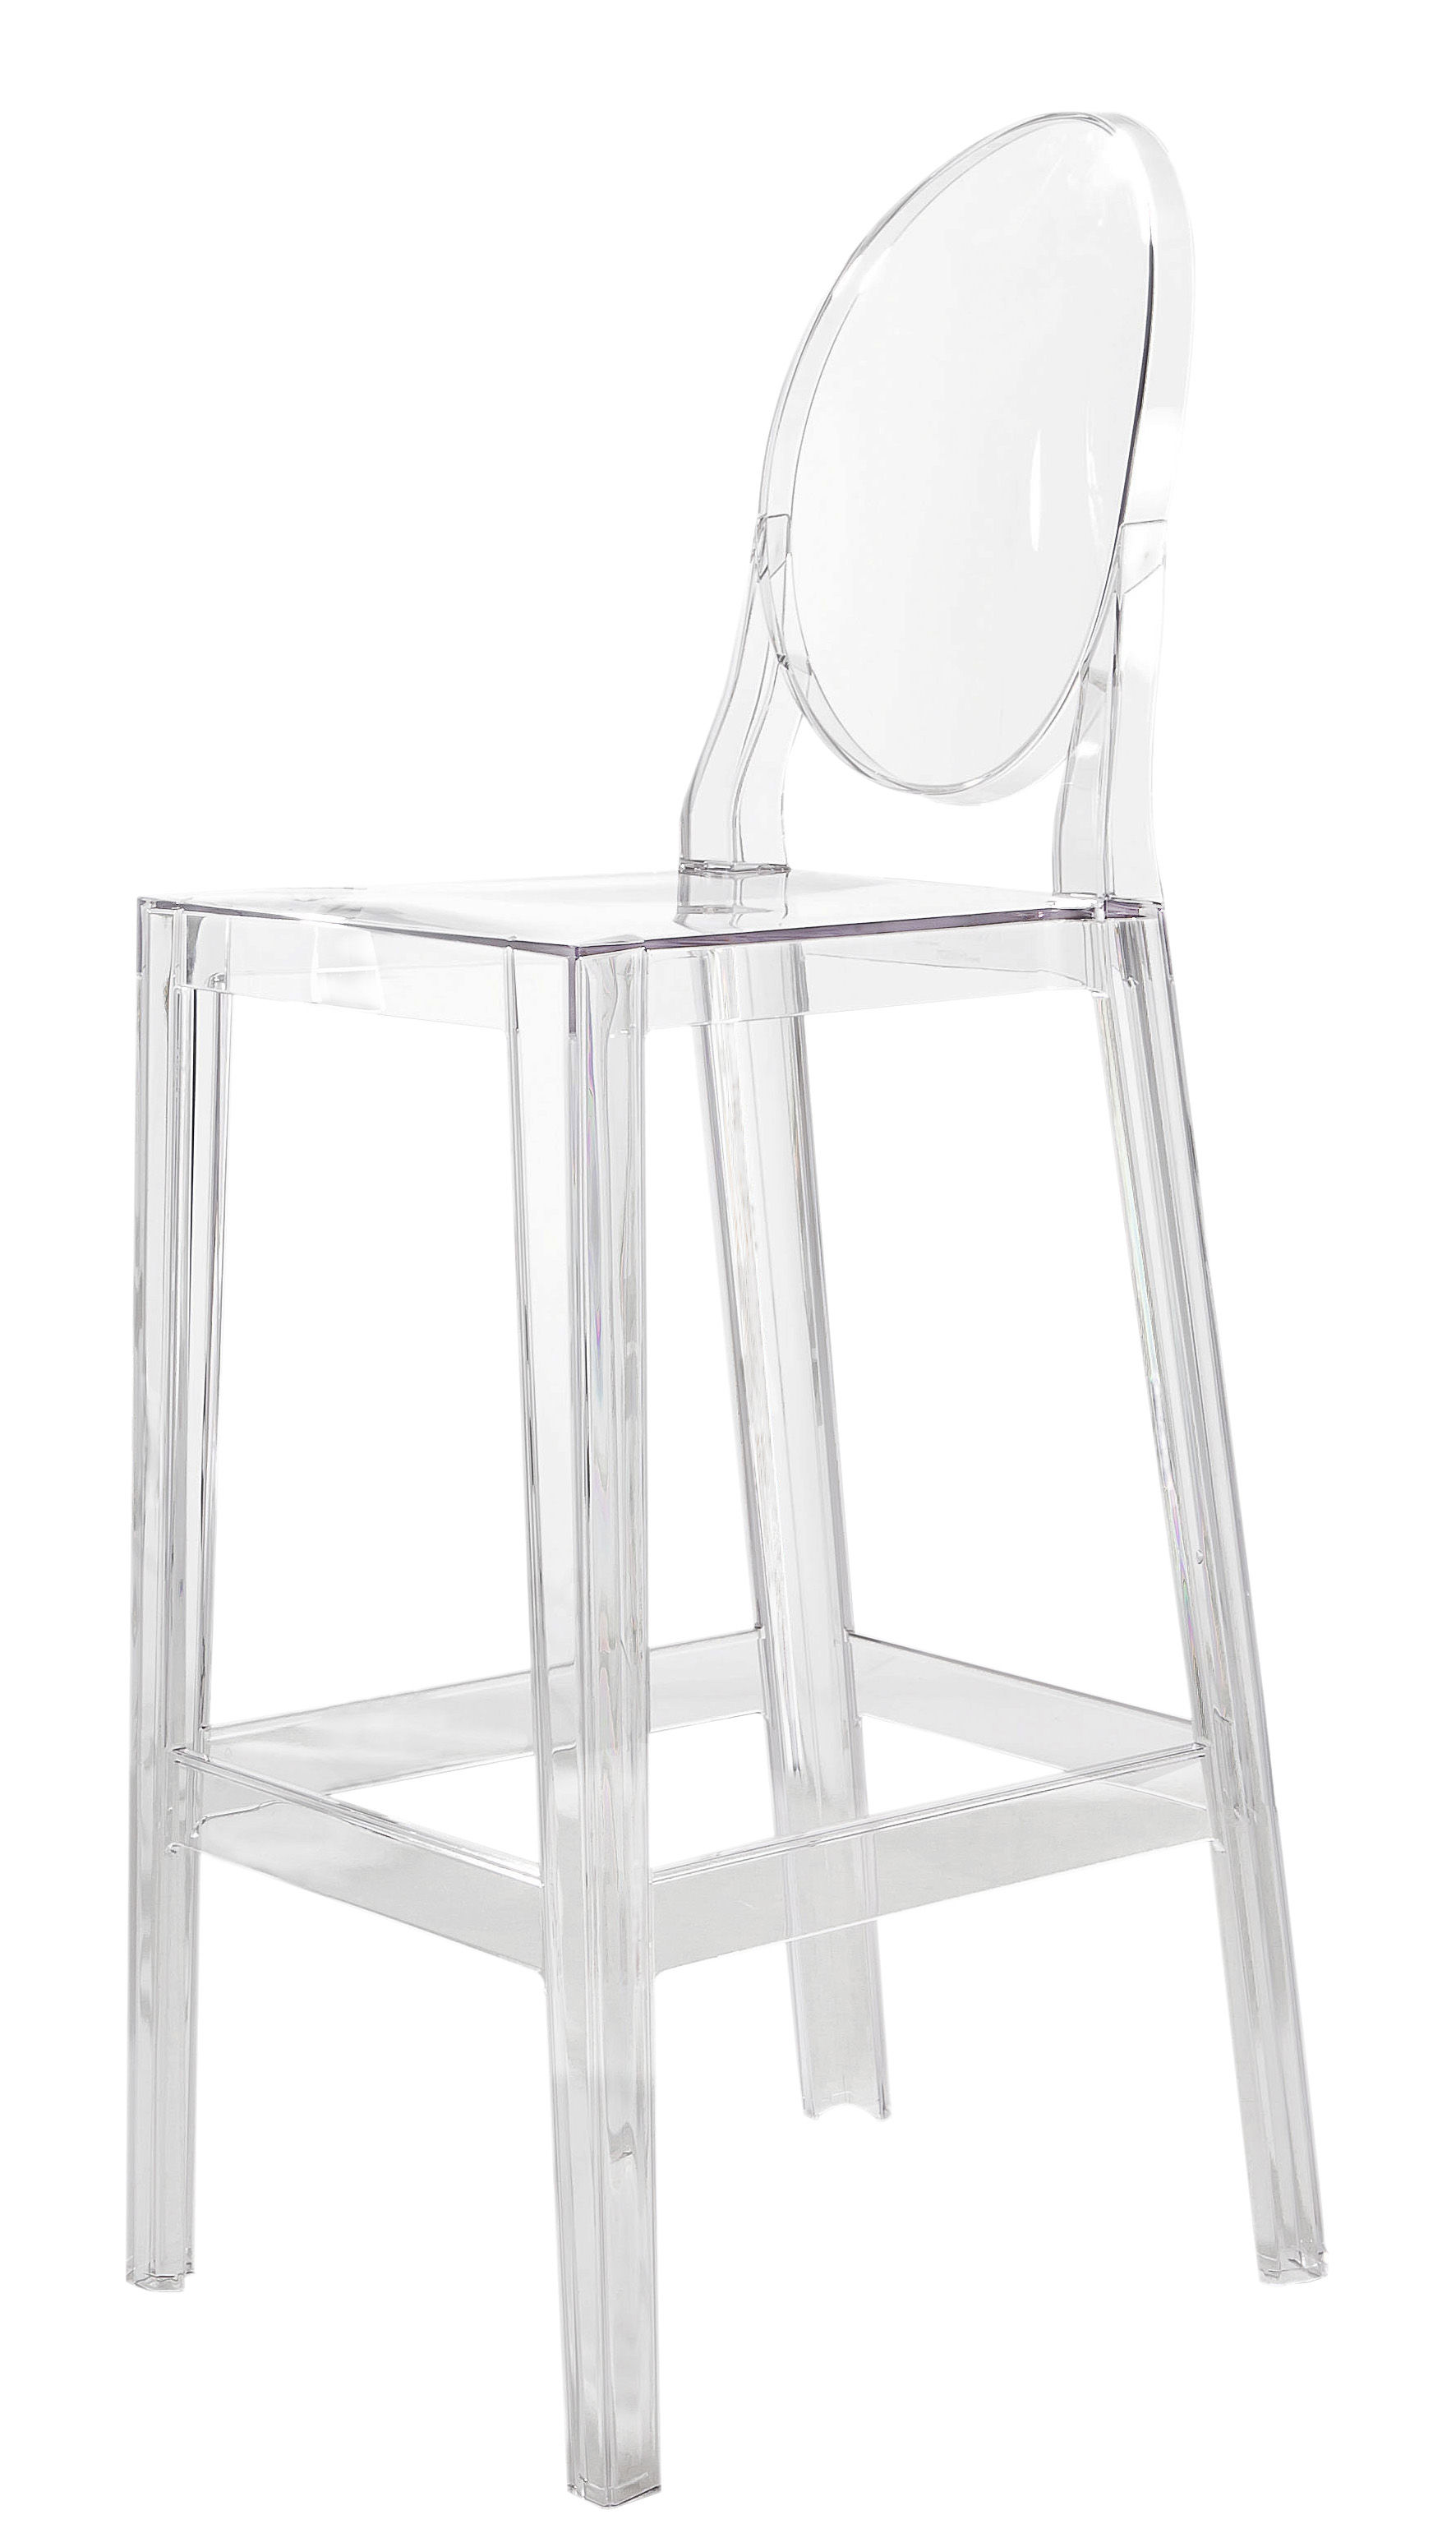 Möbel - Barhocker - One more Hochstuhl H 65 cm - Kartell - Kristall - Polykarbonat